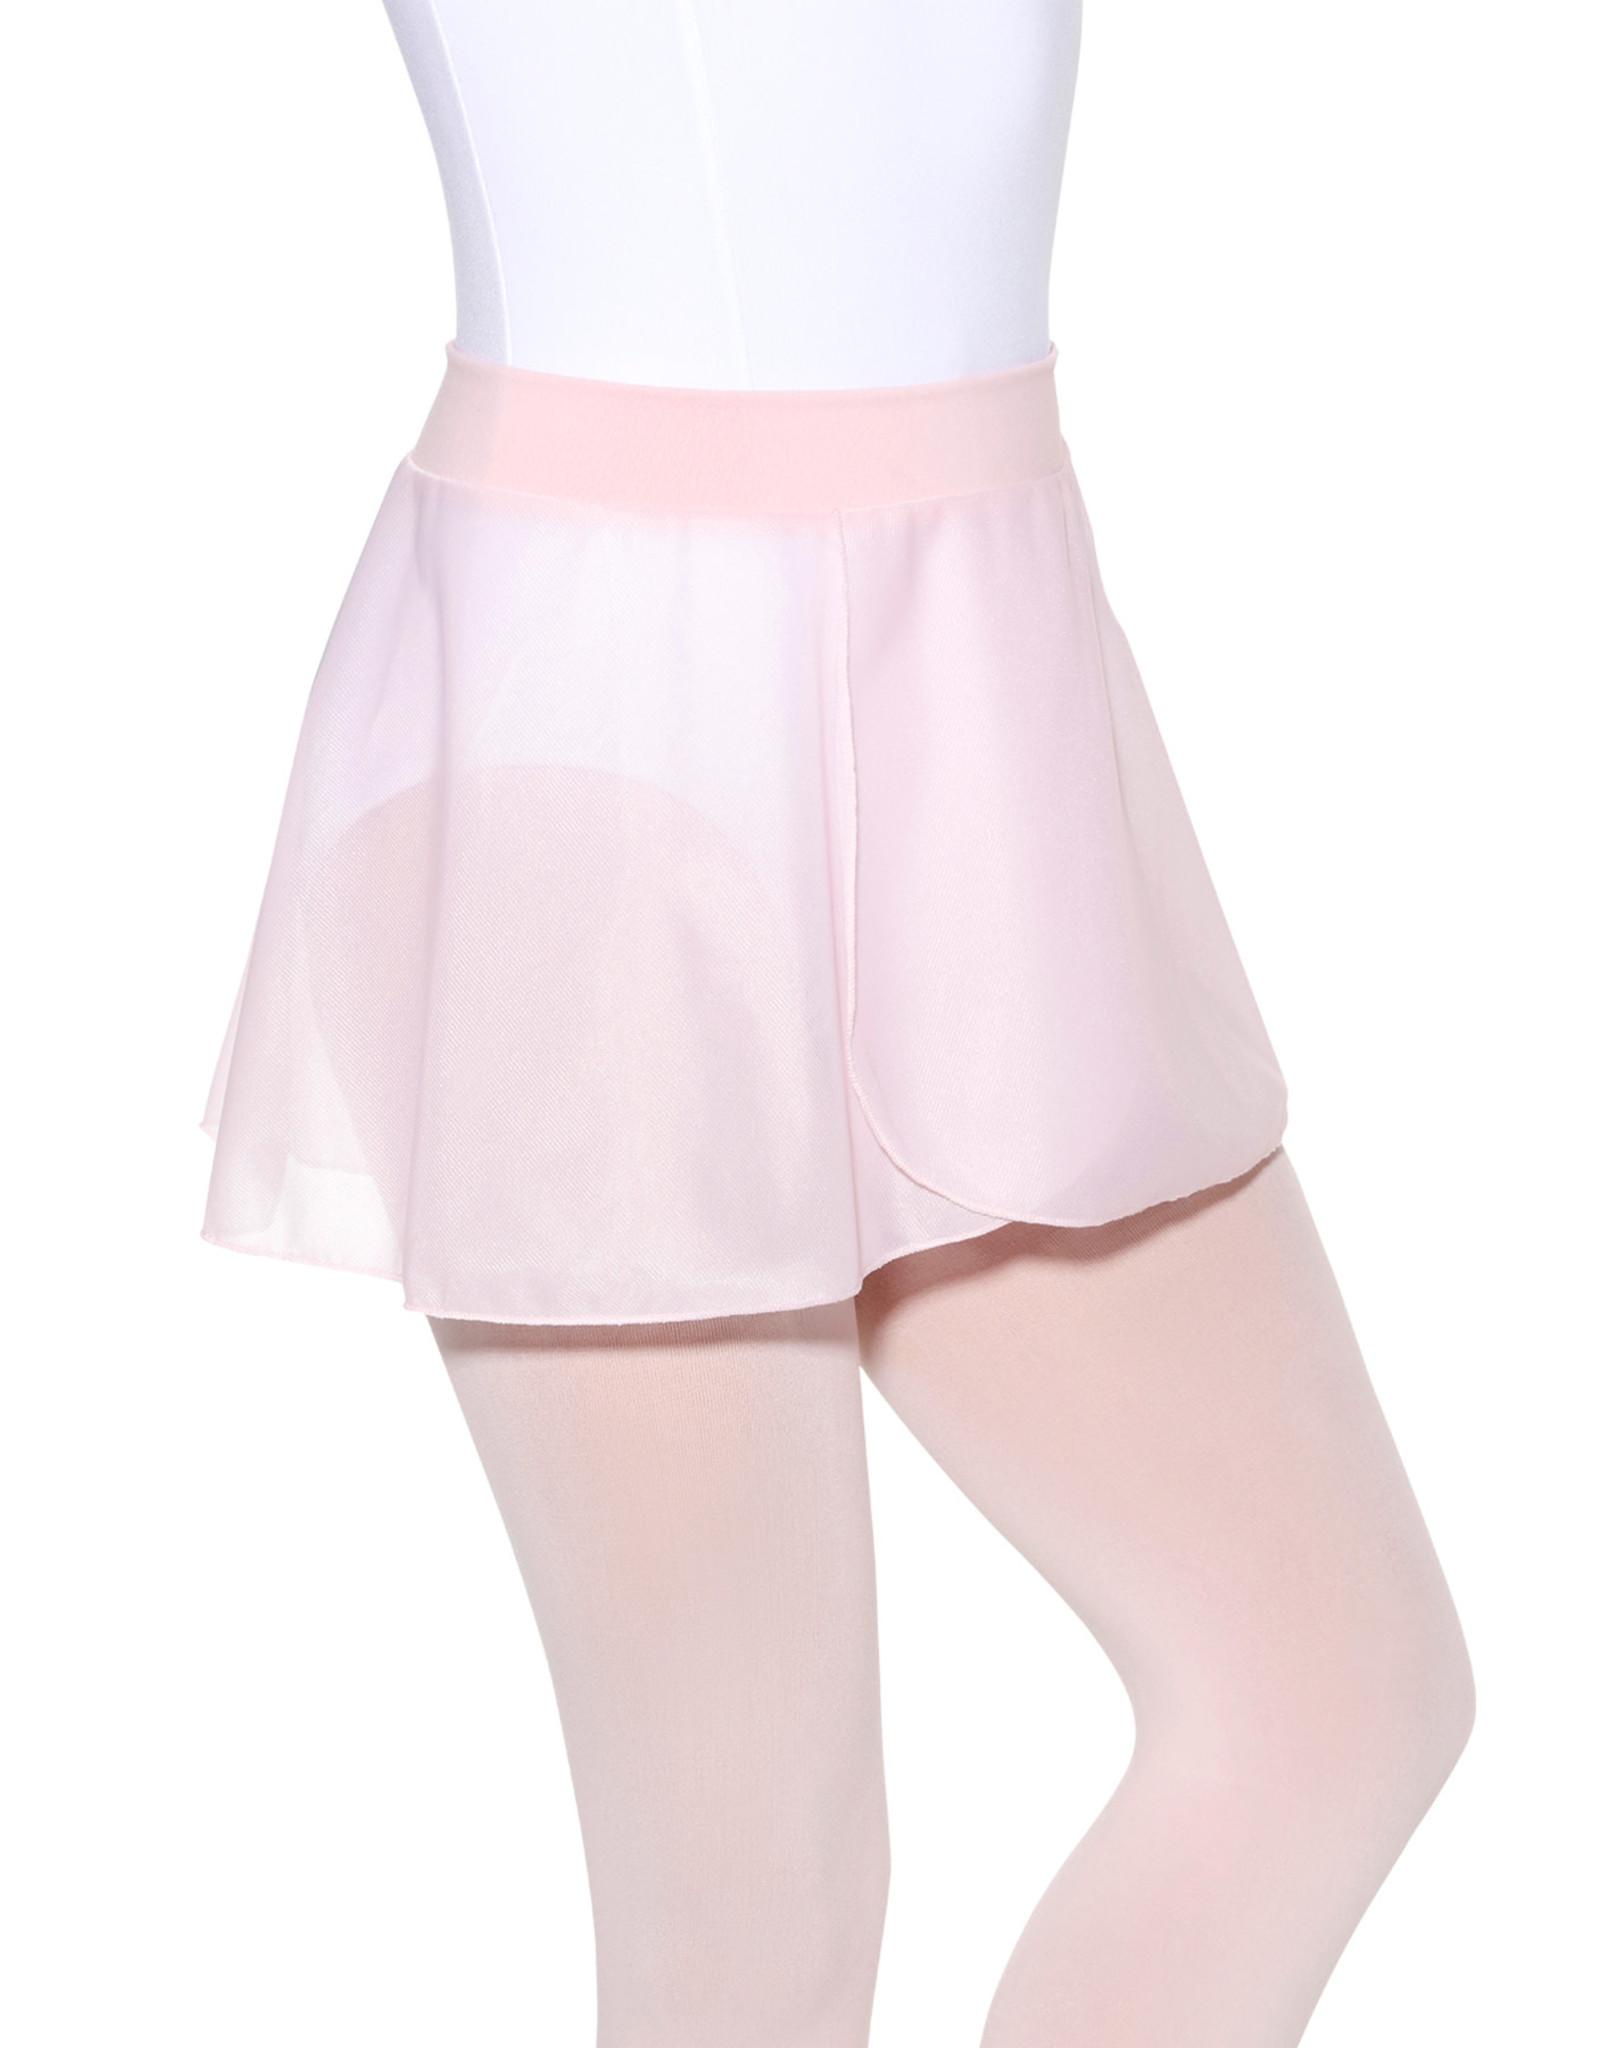 Eurotard SL61 Child pull on, sheer mock wrap skirt with cotton Lycra waistband.